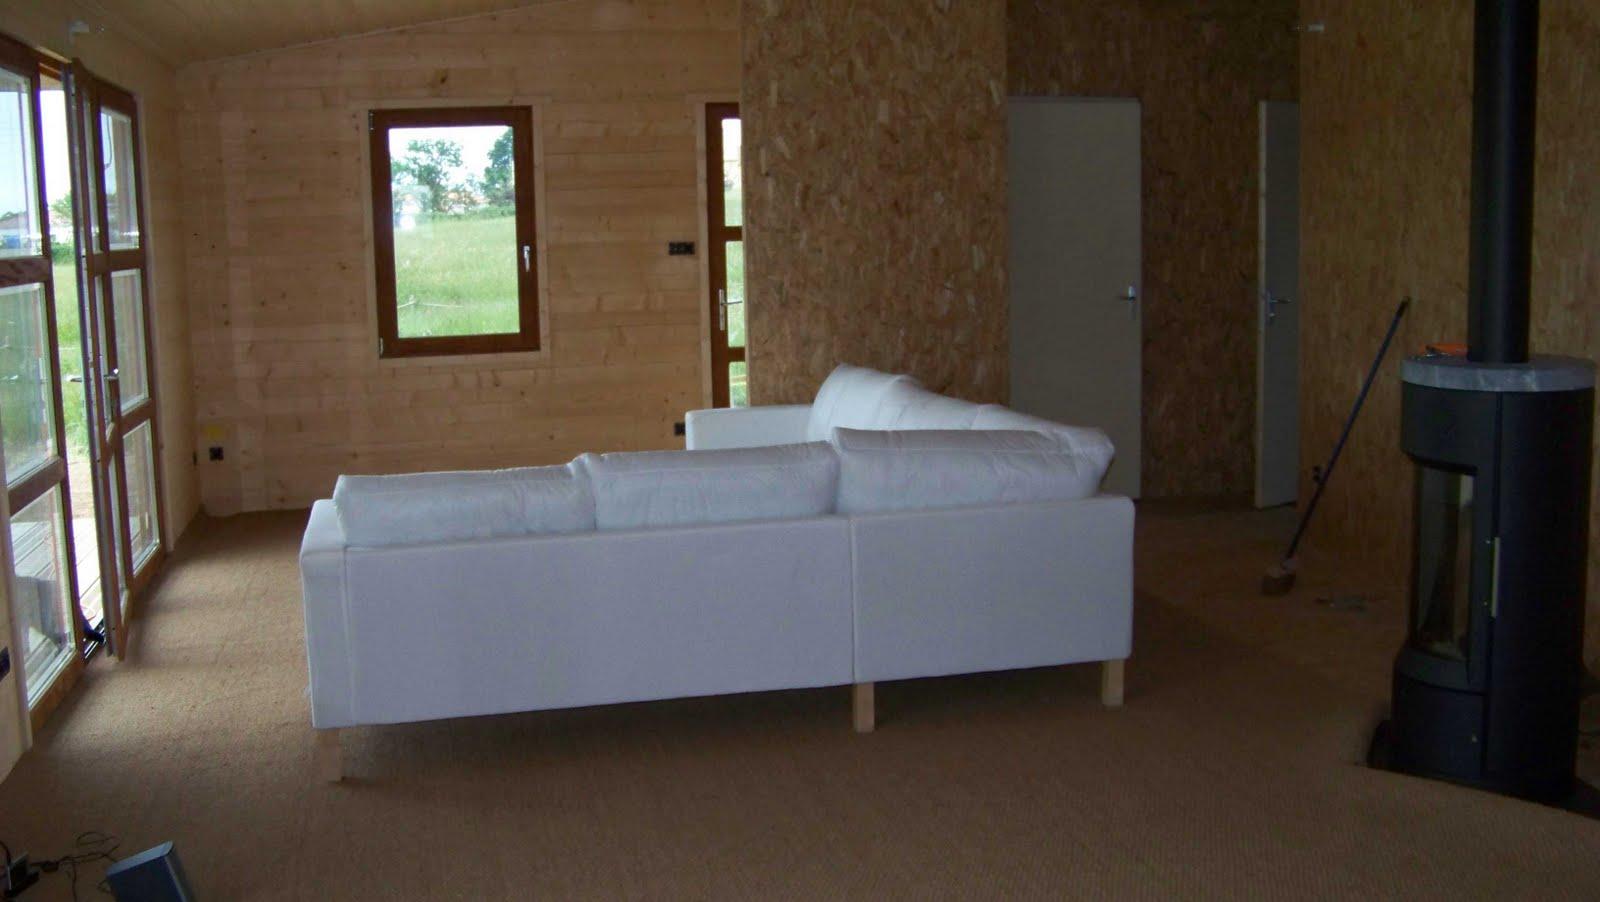 http://2.bp.blogspot.com/_Hjg3DiiCWJA/TA_2X5DZ2WI/AAAAAAAAAxw/ur8BHzdV1nw/s1600/salon+2.JPG